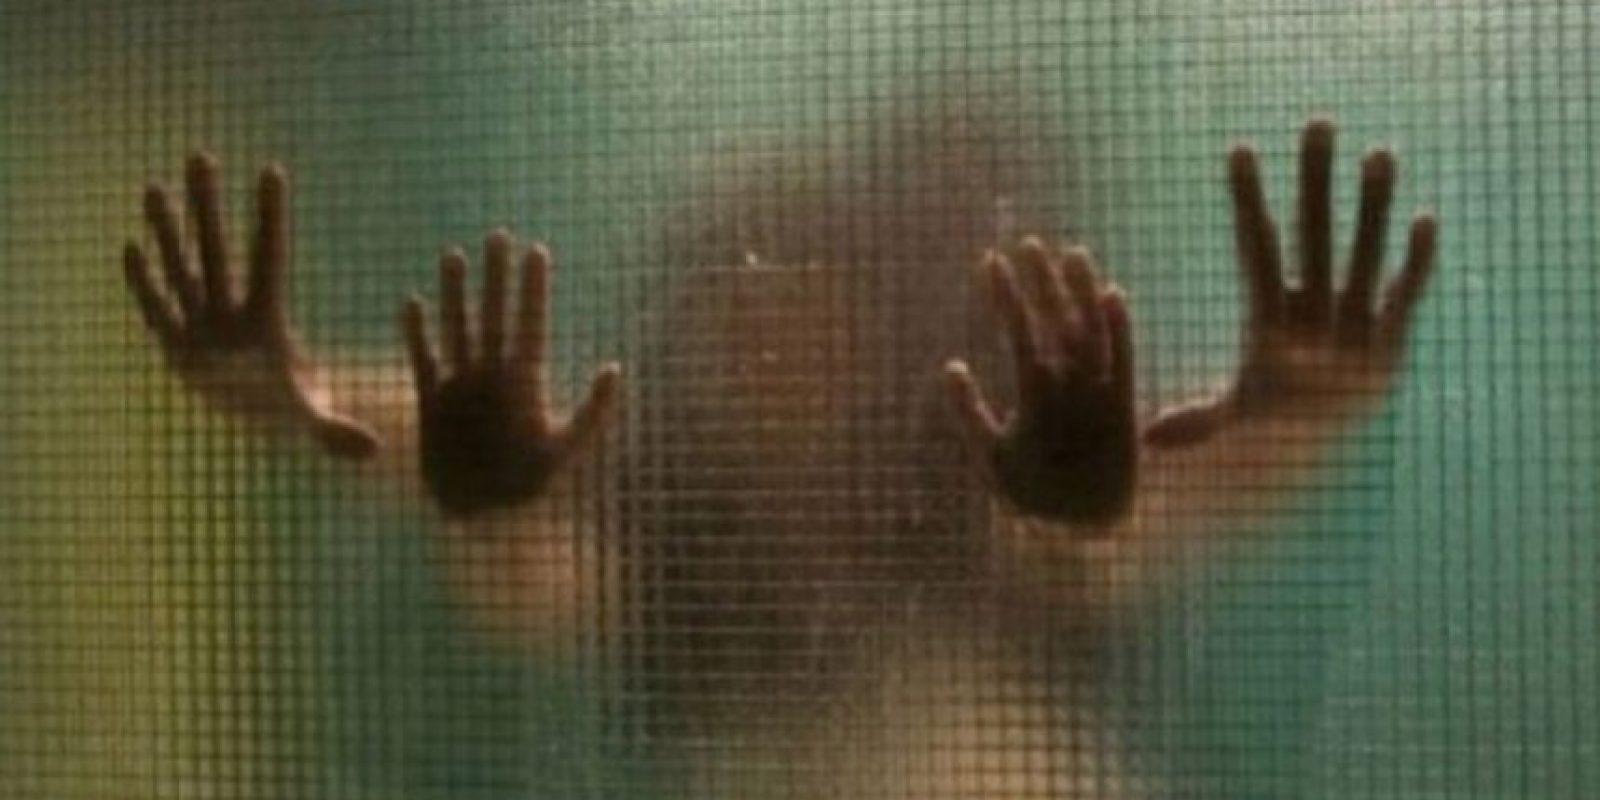 Presentará un hematoma en la zona afectada. Foto:Tumblr/Sexo